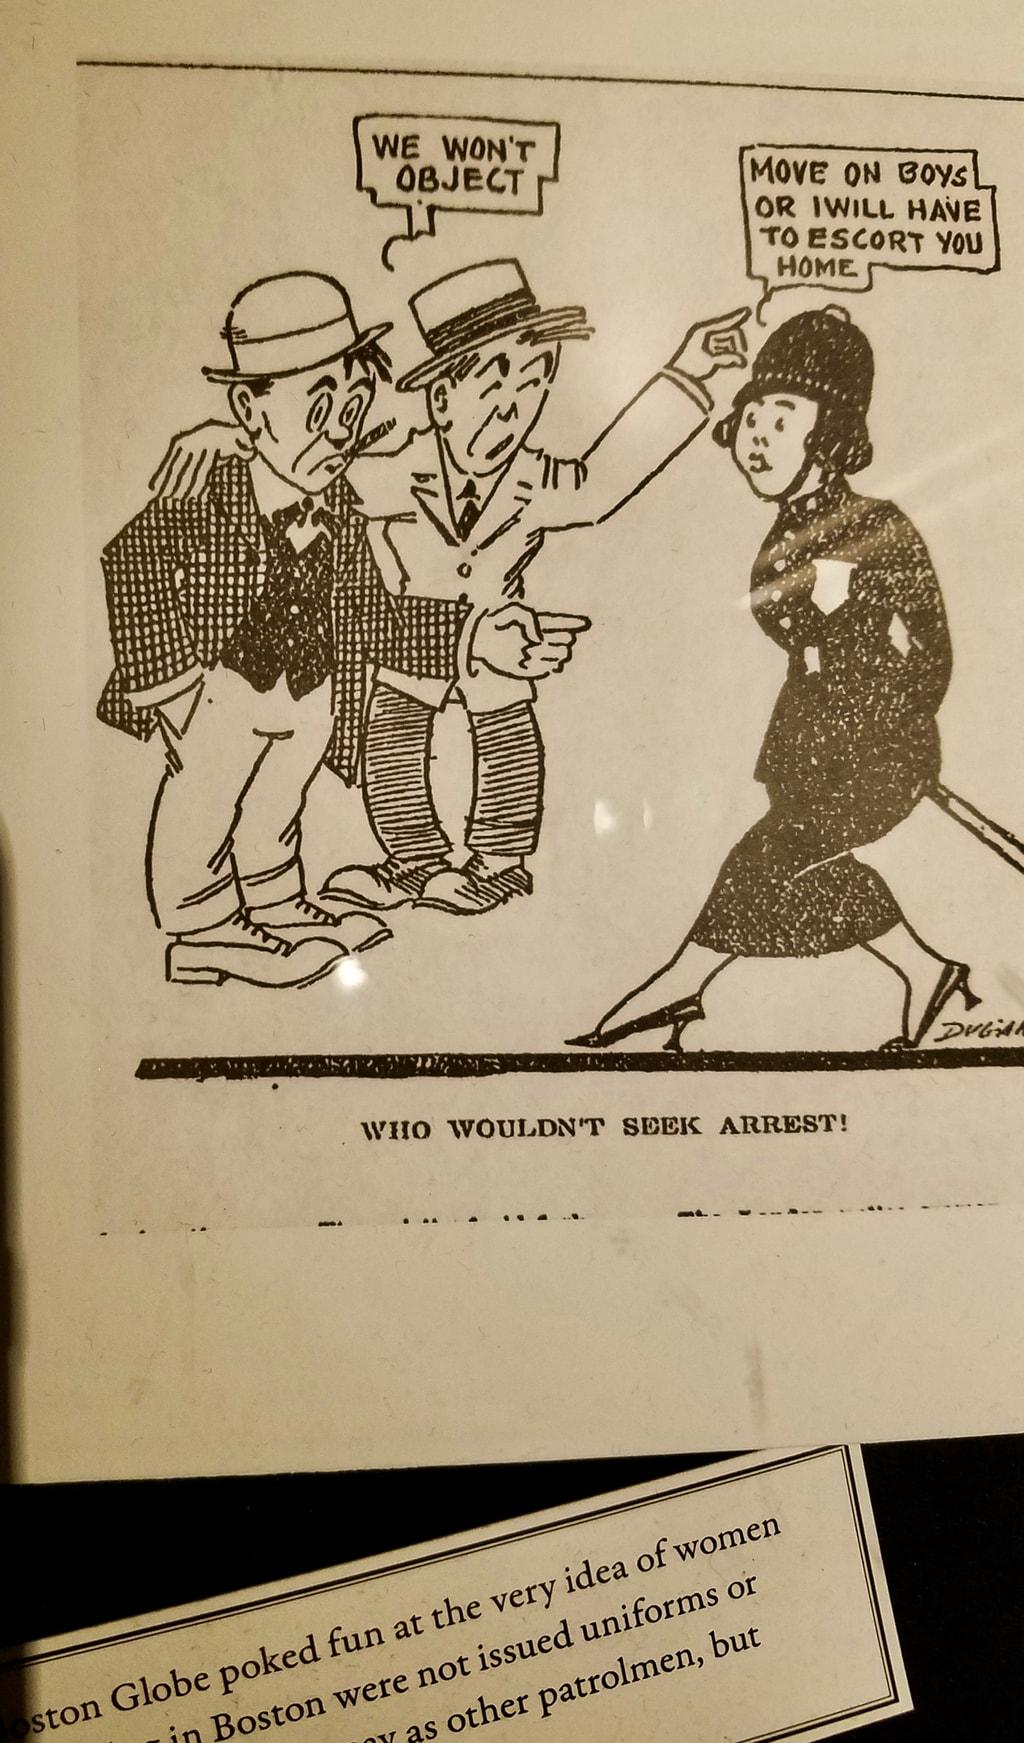 Woman Cop Cartoon, Loews Boston Hotel